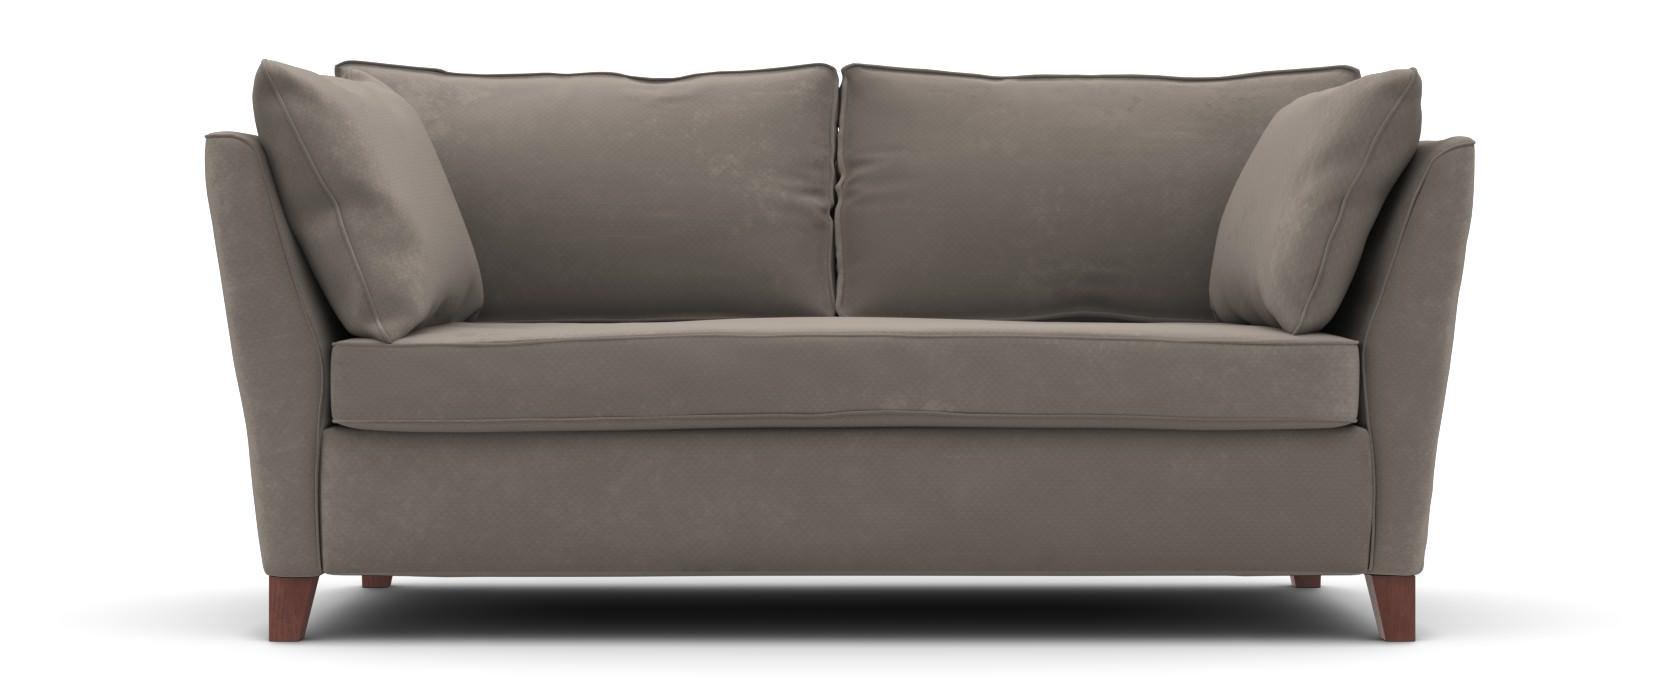 Тримісний диван Stefano - Pufetto